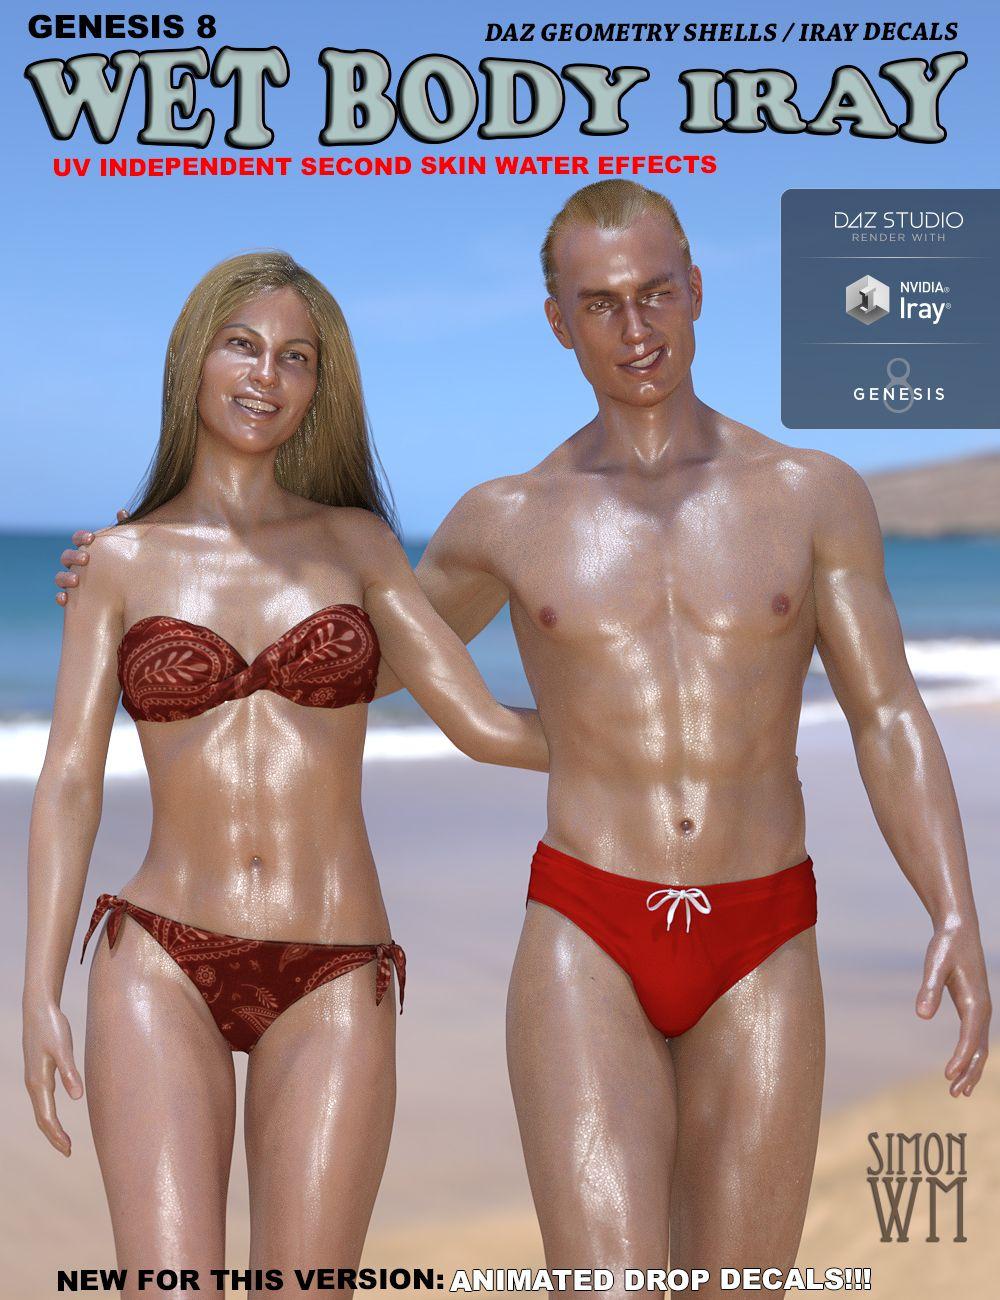 Genesis 8 Wet Body Iray by: SimonWM, 3D Models by Daz 3D